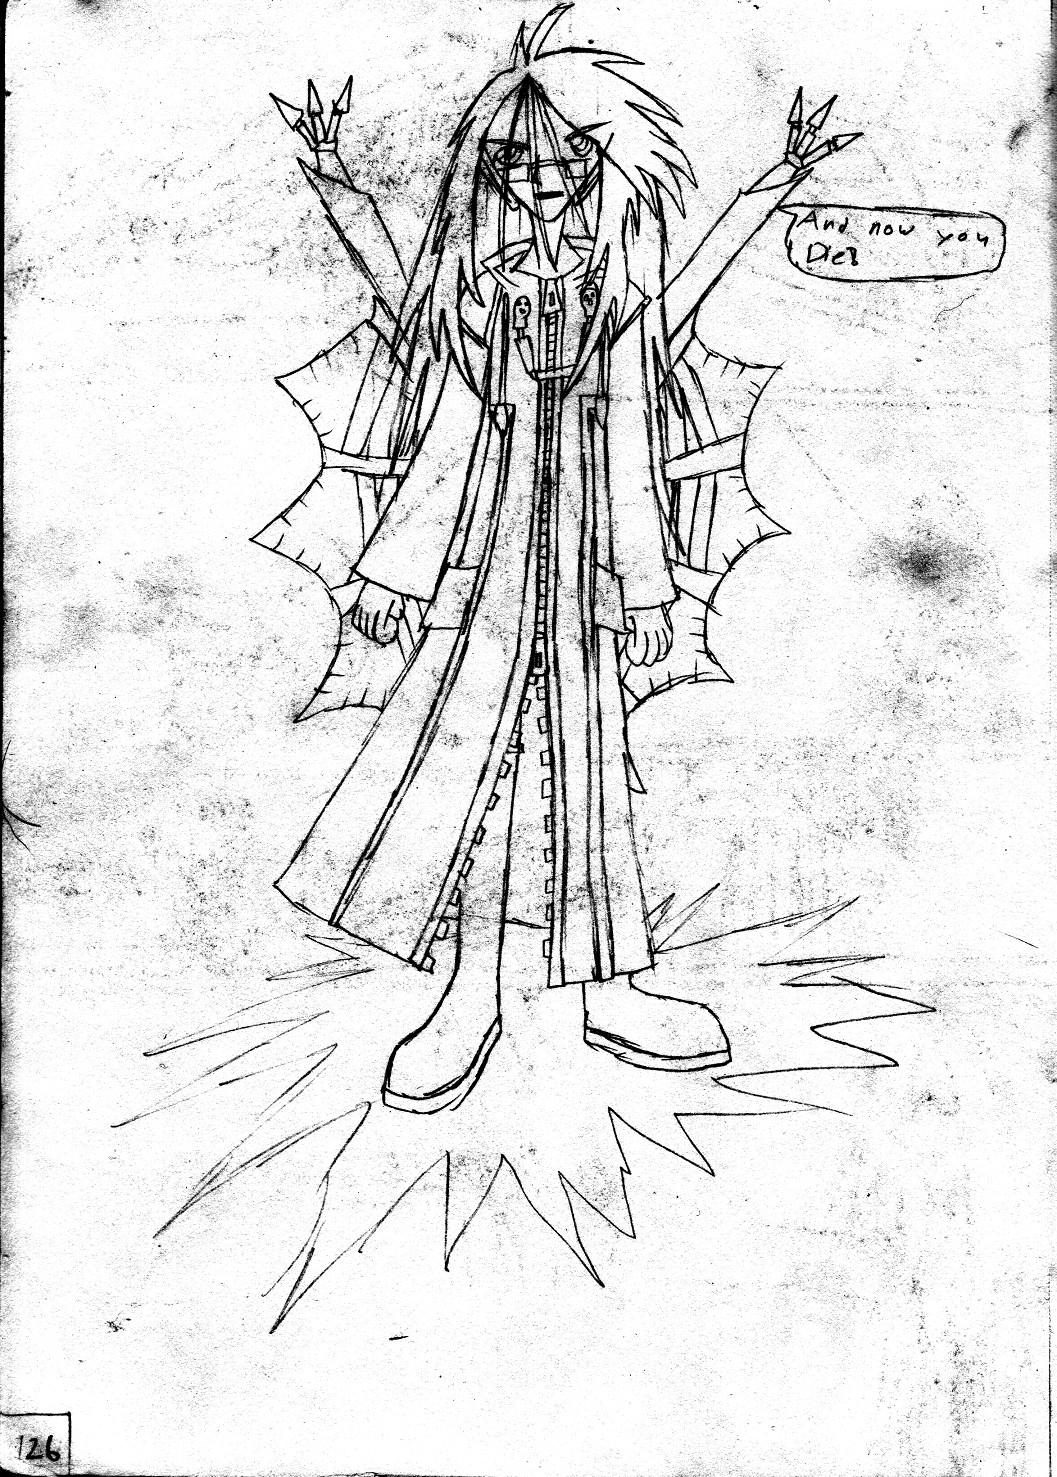 Kingdom Hearts Destined Waltz Page 126 by NIX